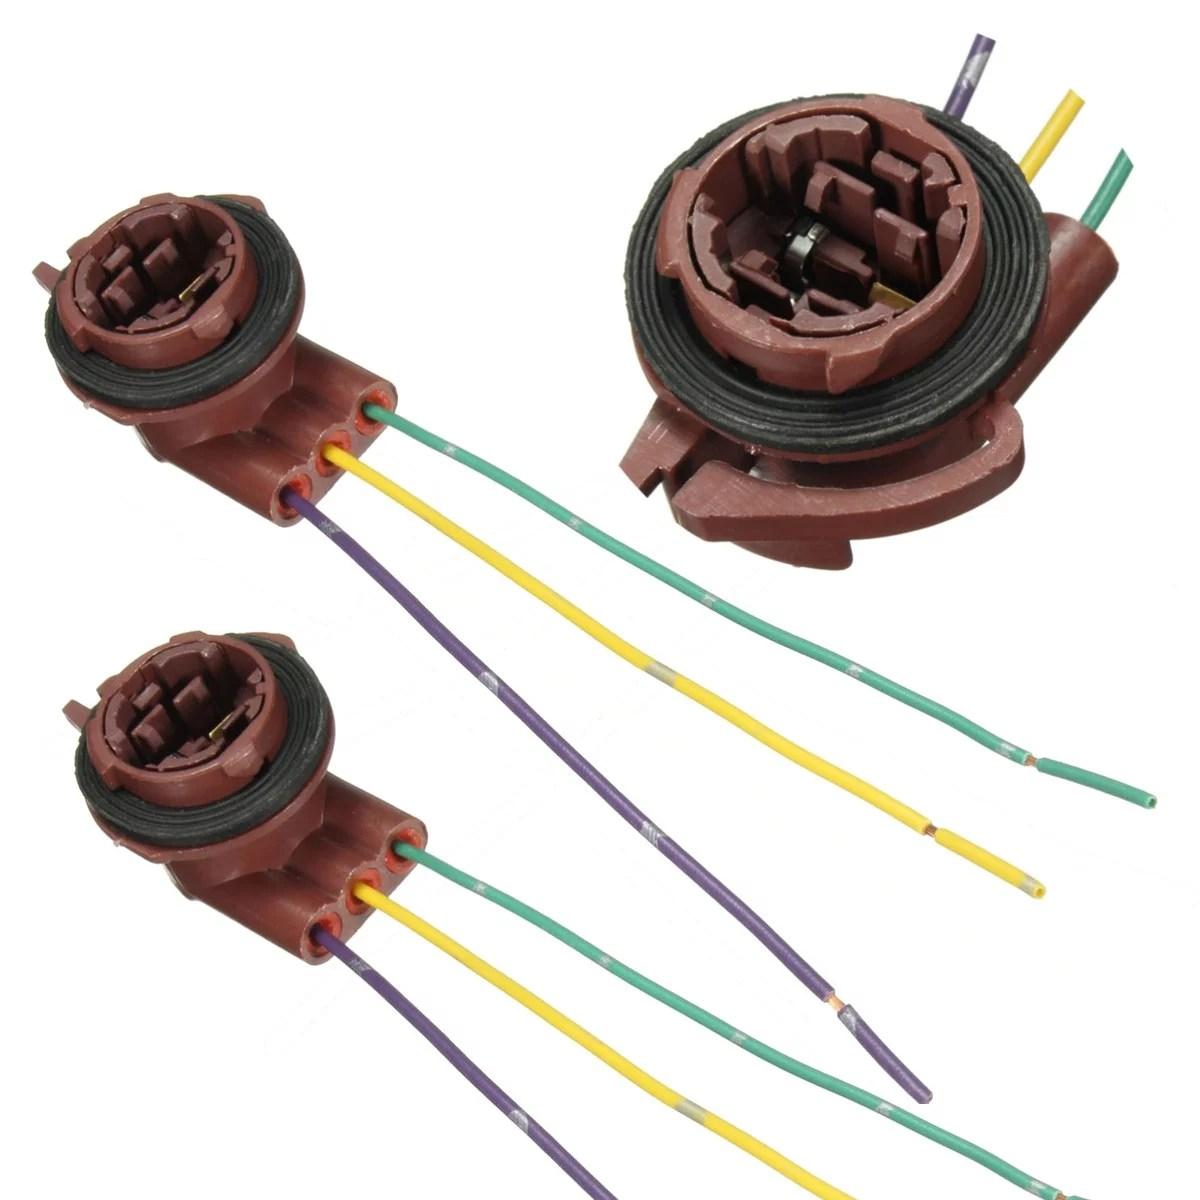 small resolution of matcc 2pcs 12v brake turn signal indicator light socket wiring electrical wiring handyman 3157 light socket wiring diagram